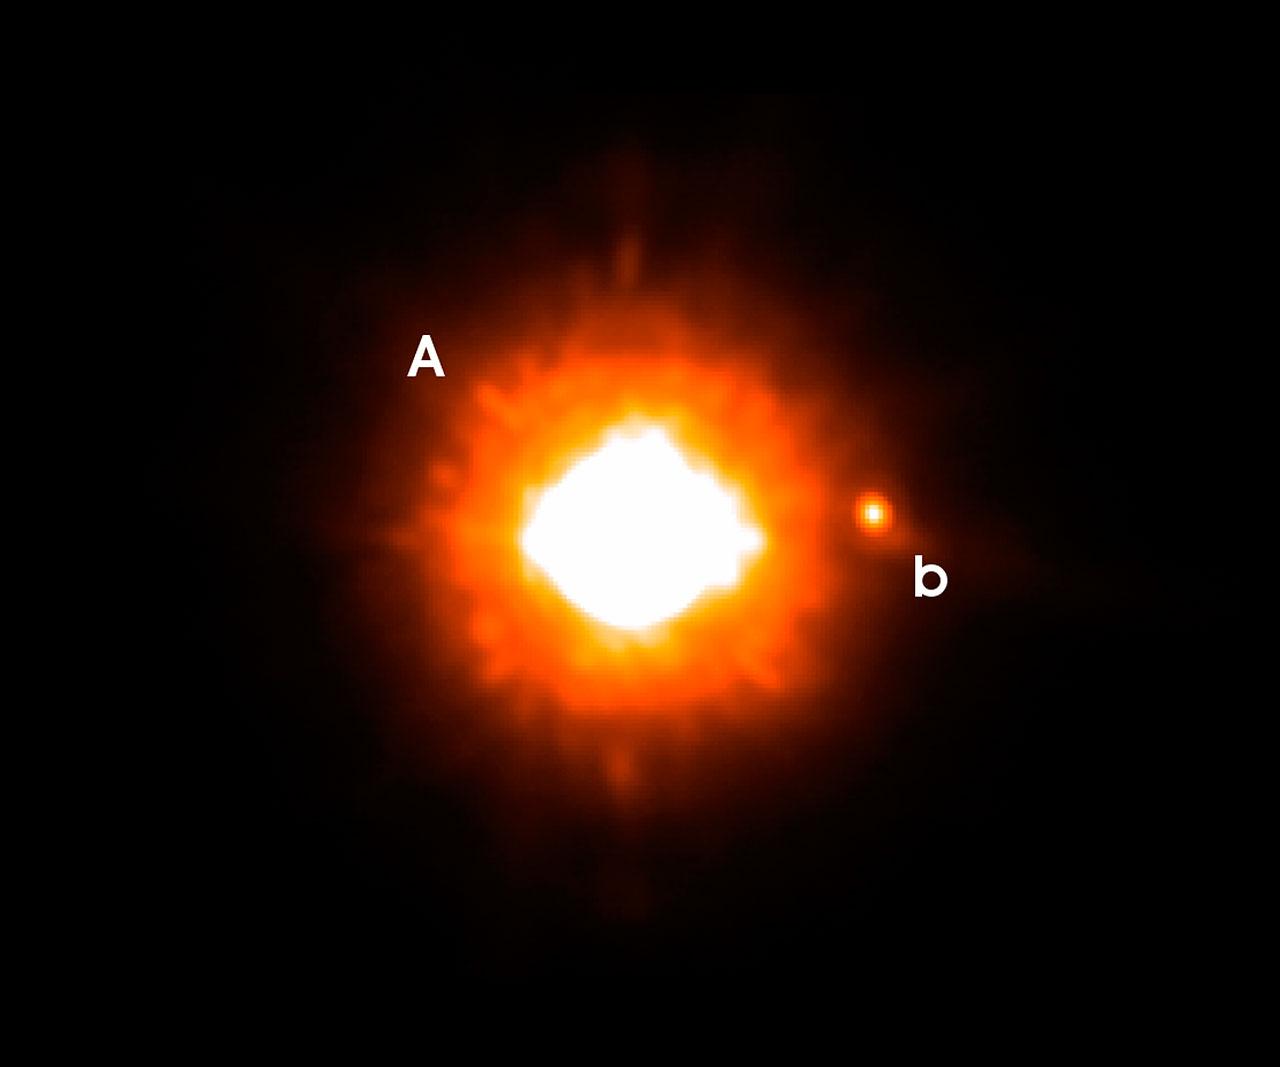 The Sub-Stellar Companion to GQ Lupi